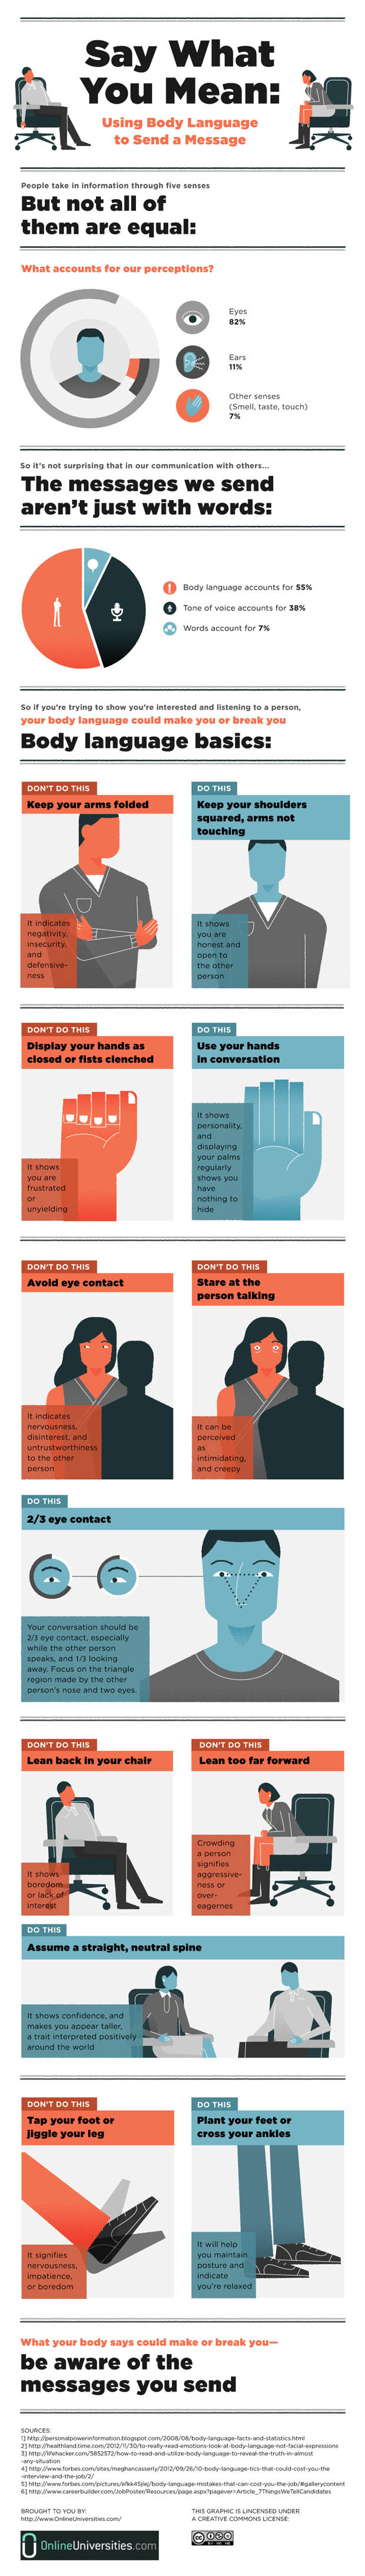 infografia lenguaje corporal